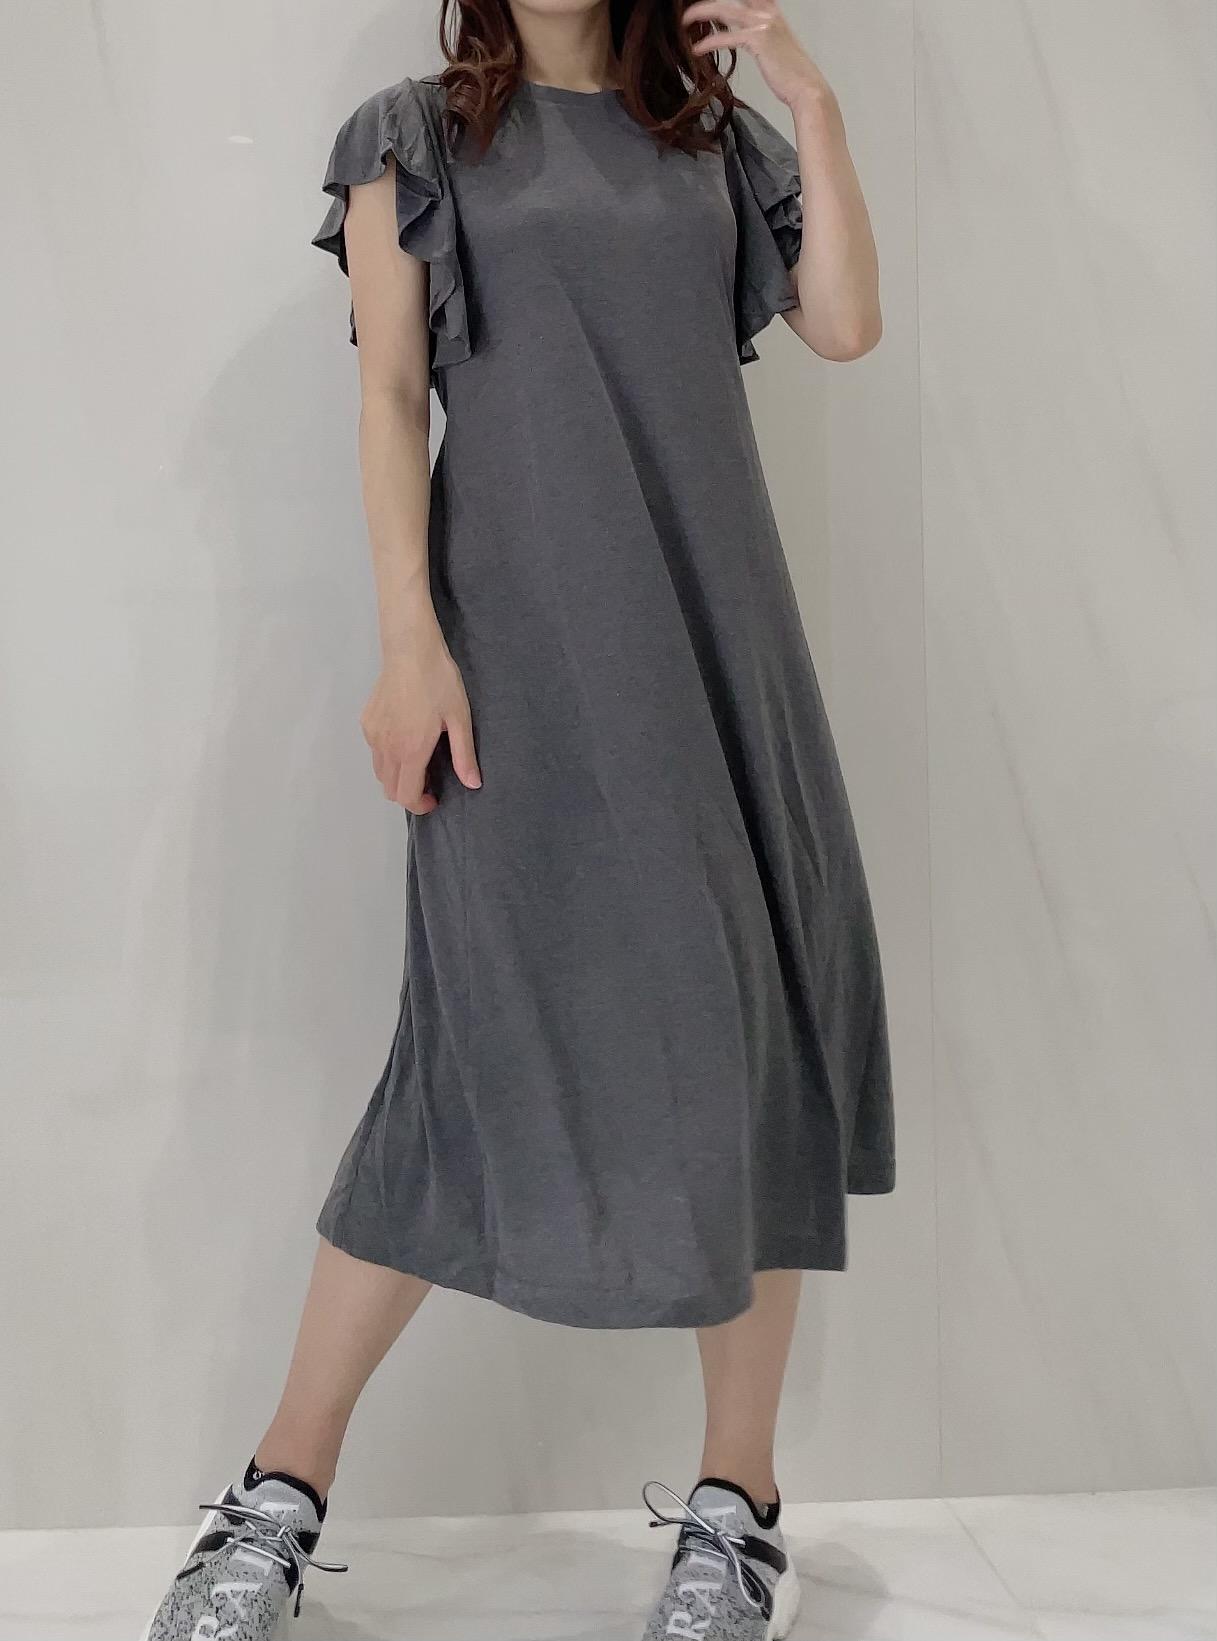 【selva secreta】Tshirt one-piece(gray)